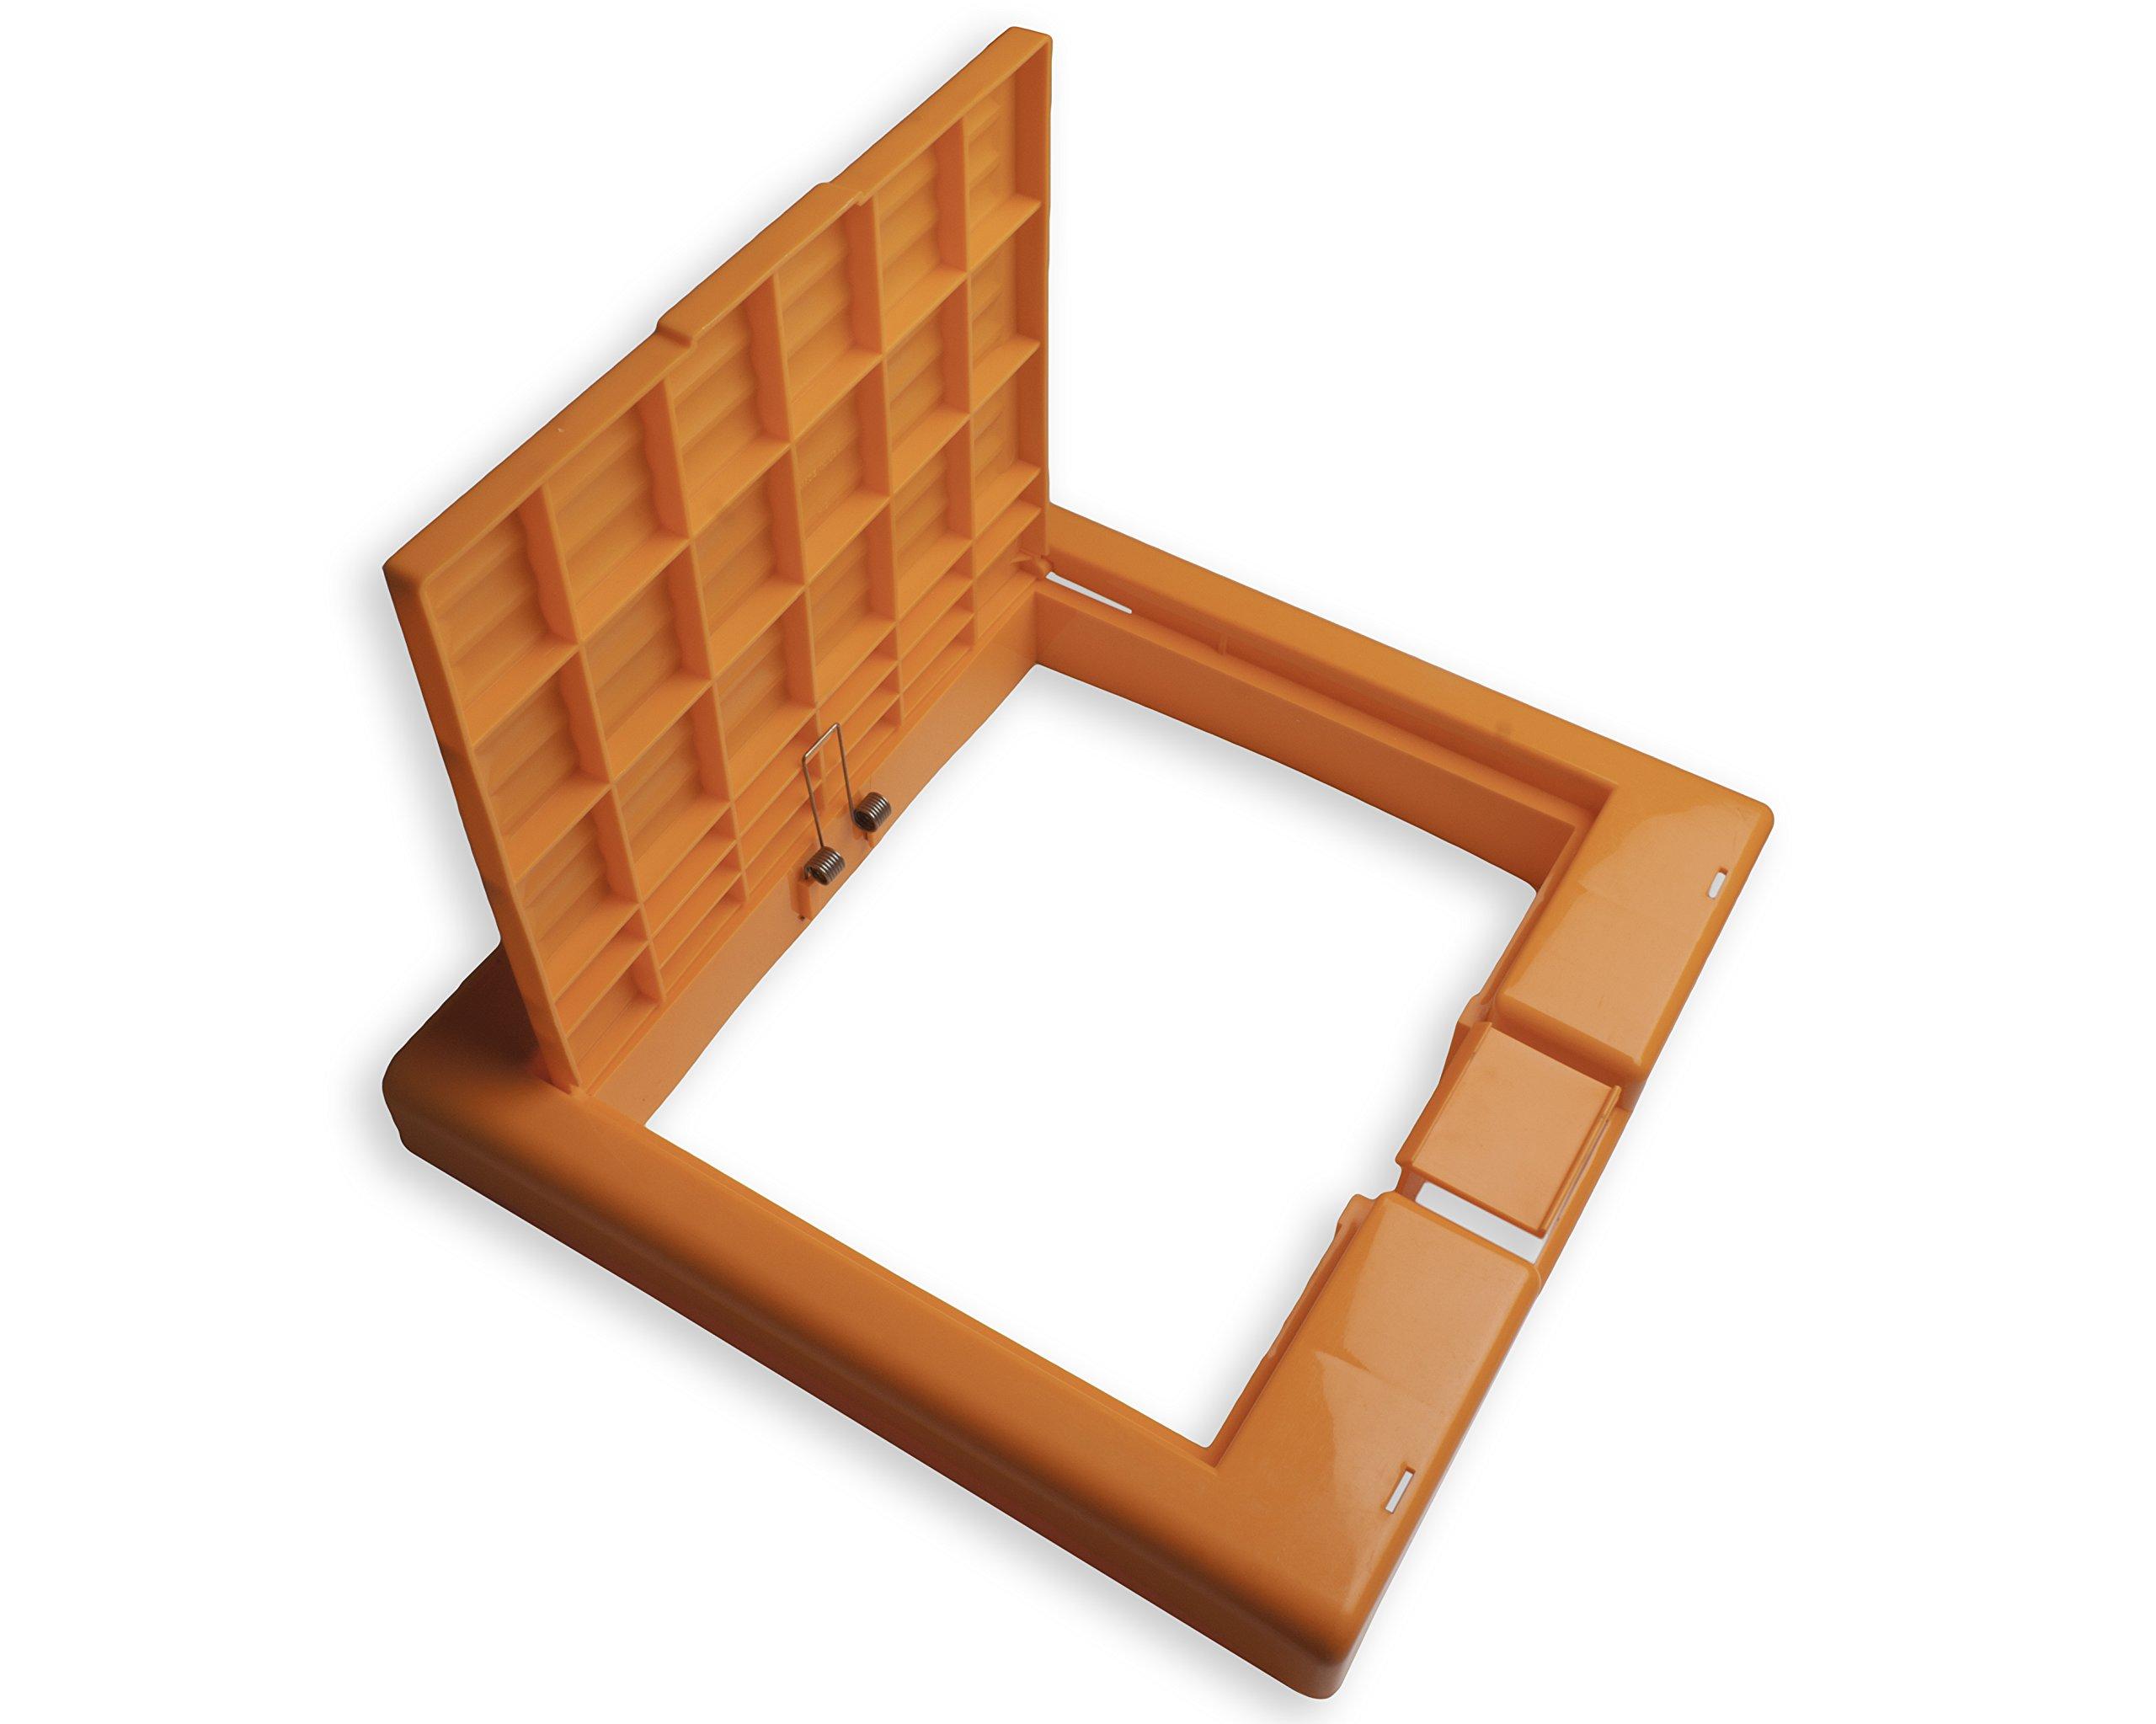 Bel-Art Clavies Orange Biohazard Bag Holder Cover for F13192-0002 and F13192-0003 (F13192-0102)